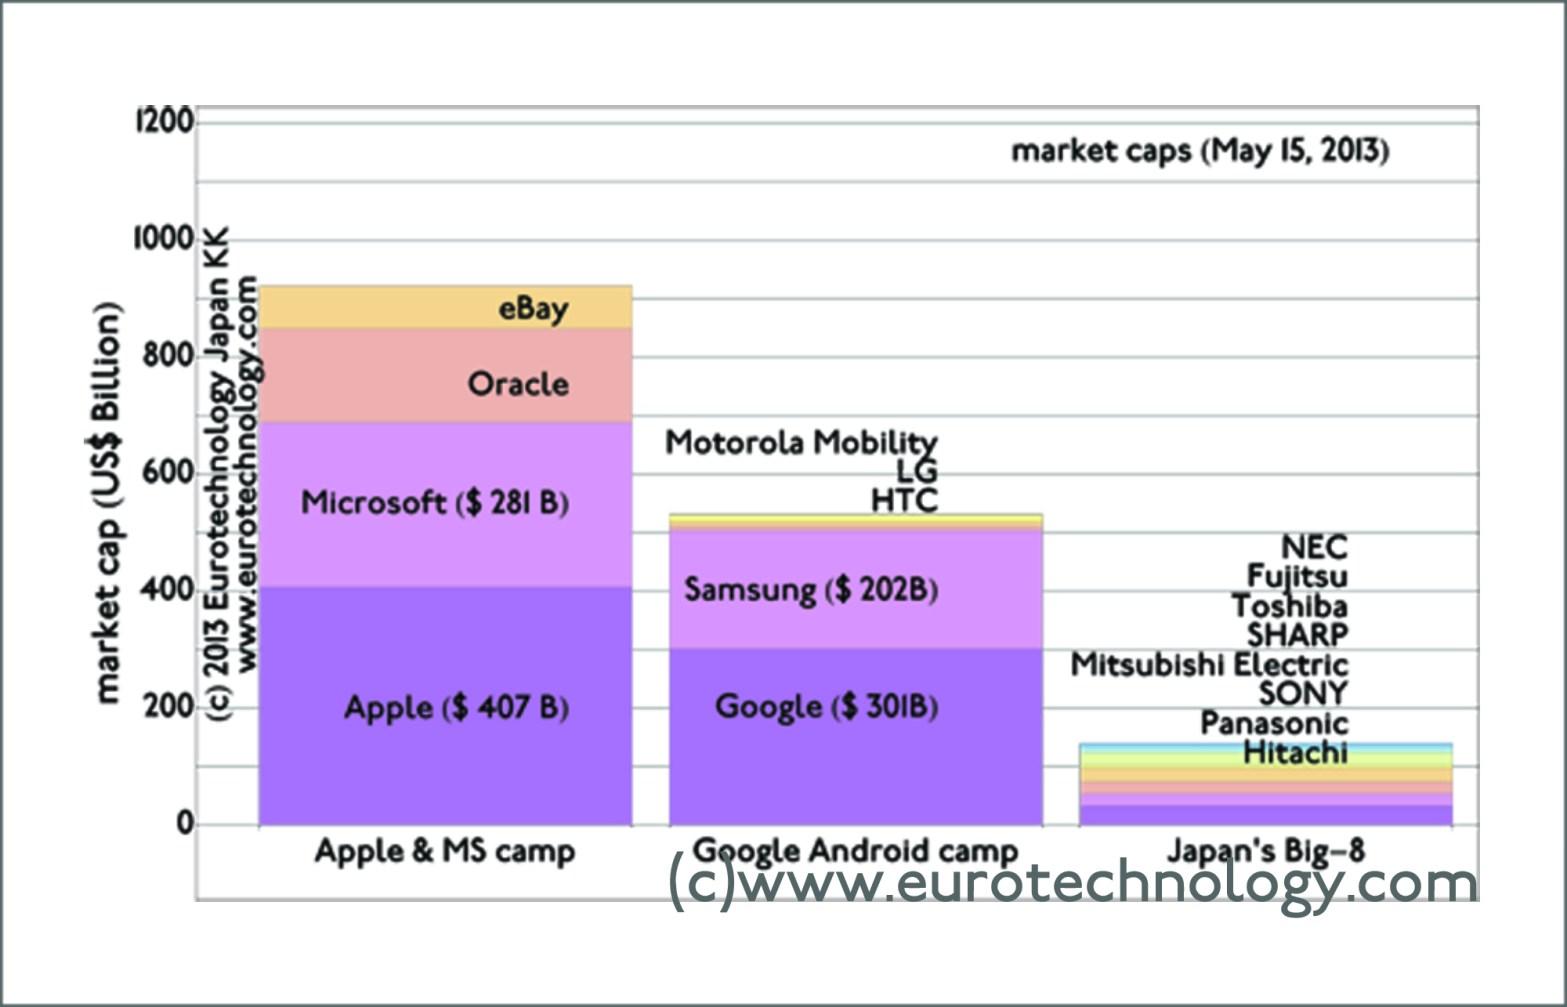 market caps of Japan's electronics industry vs US and Korea